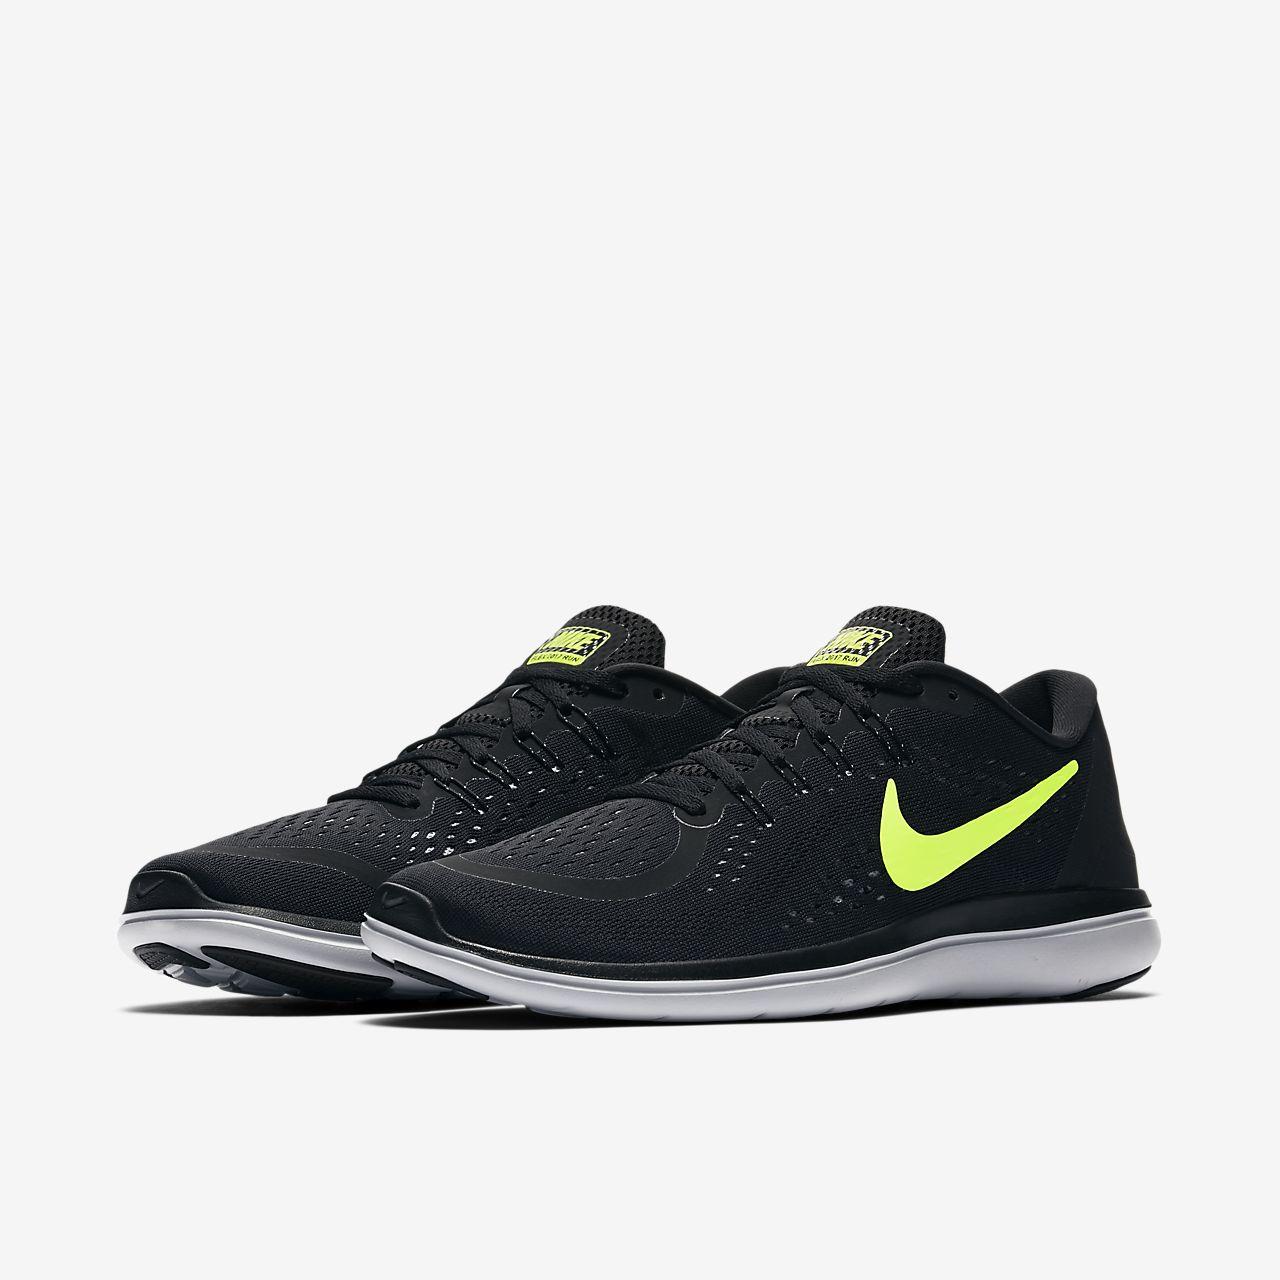 305cf638d6eee Off53 Sconti Acquista Corsa Scarpe Nike qHwZIft